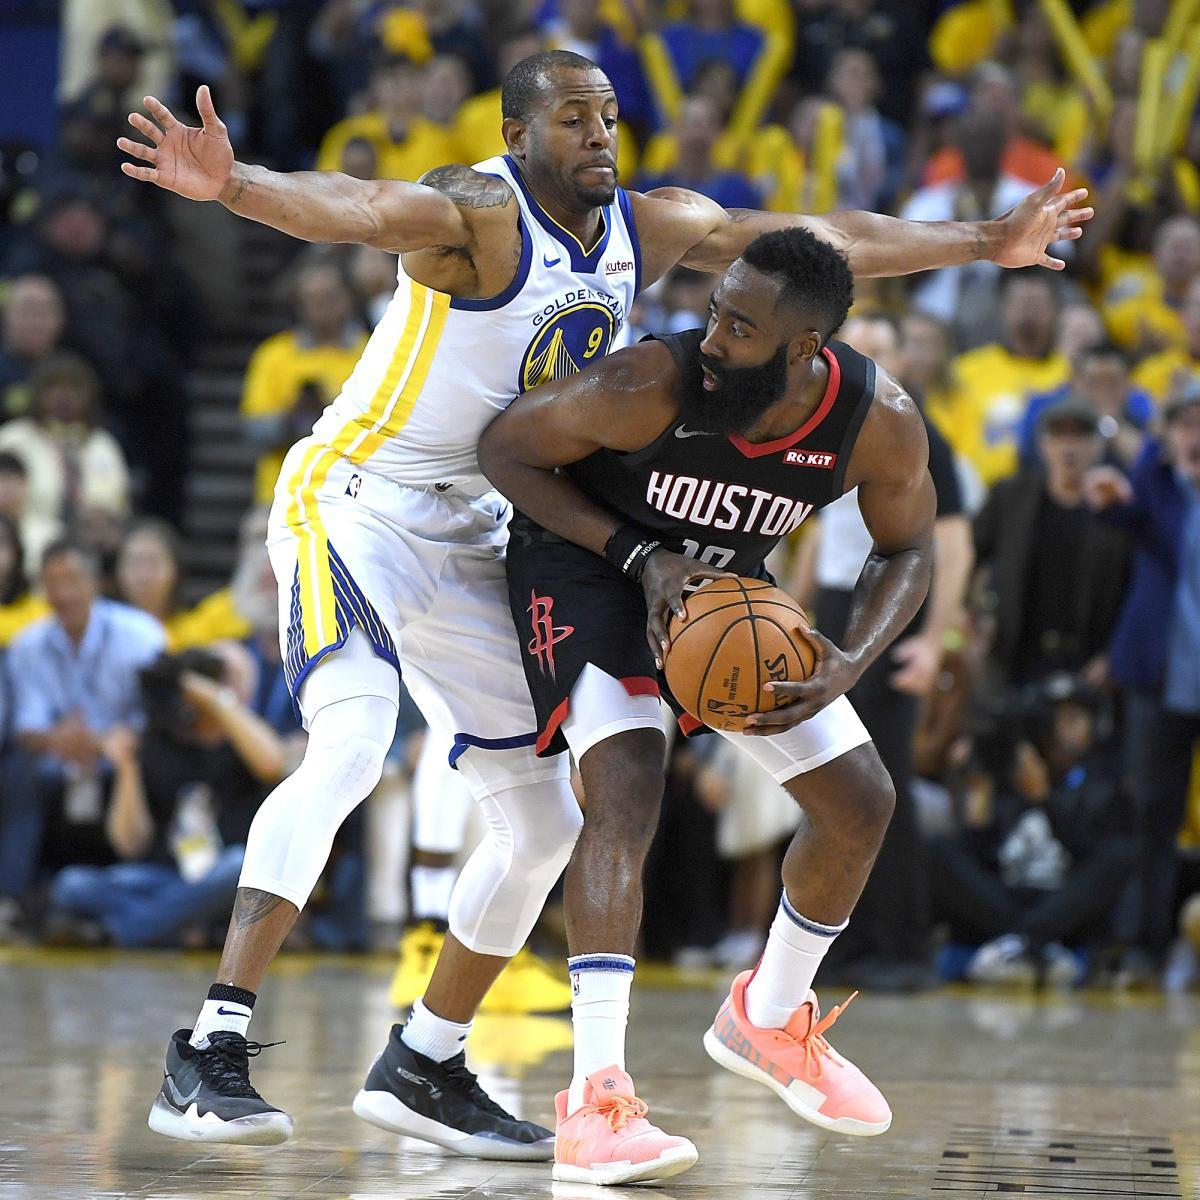 Golden State Warriors Vs Houston Rockets Live Stream Free: Rockets Vs. Warriors L2M Report: James Harden Wasn't